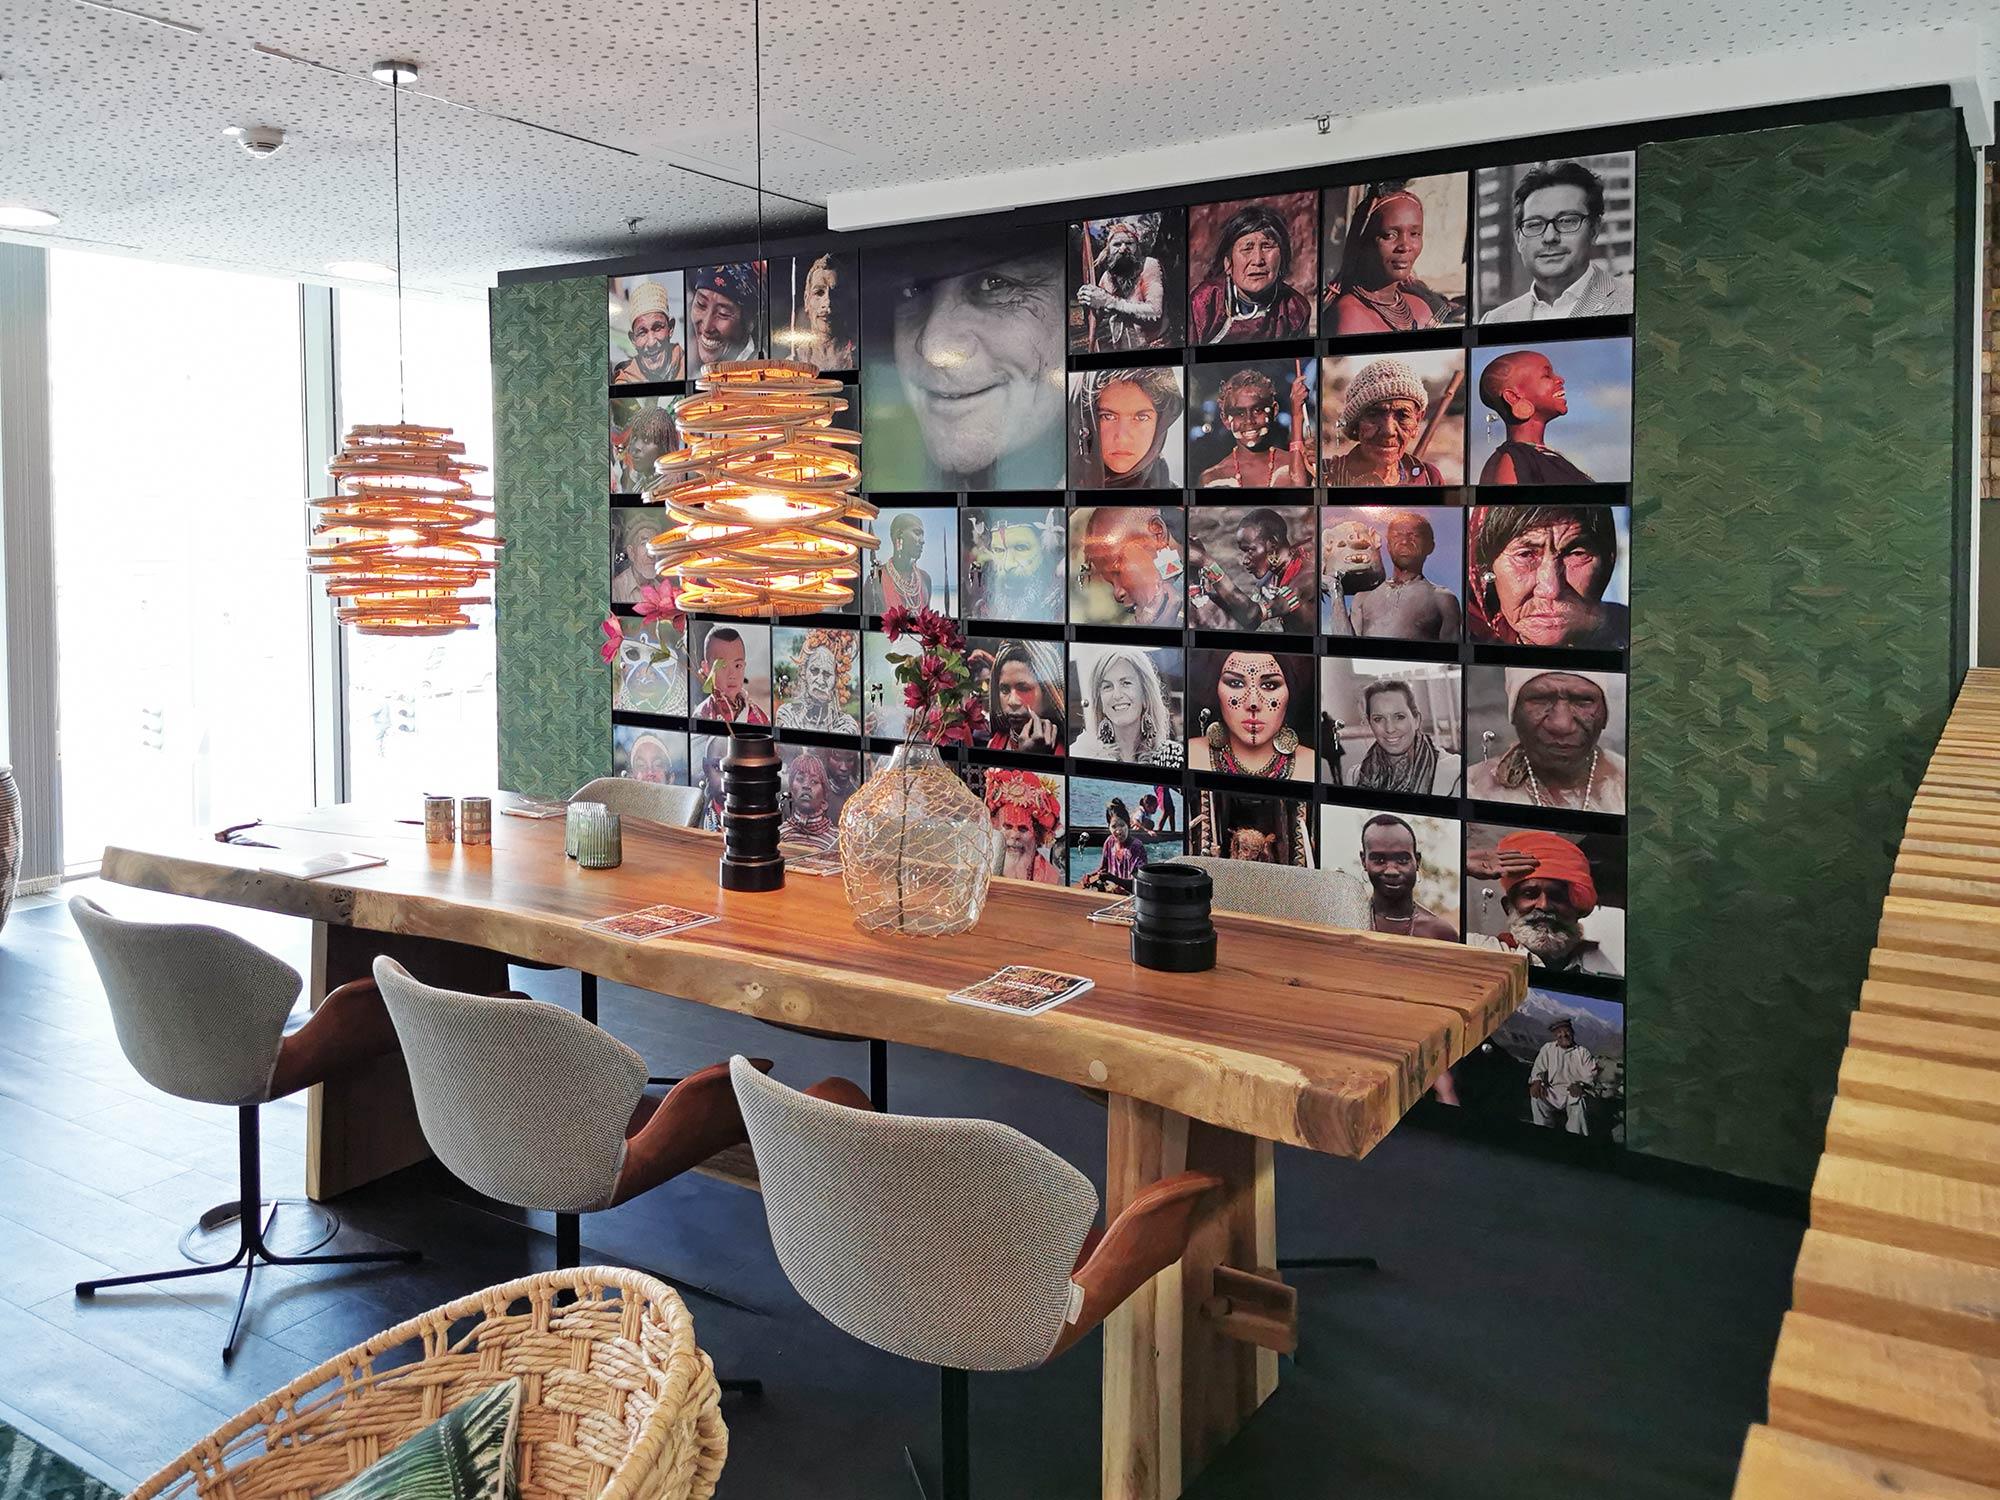 Tribes Coworking Frankfurt - Coworking Frankfurt Tipp - Architektur innen